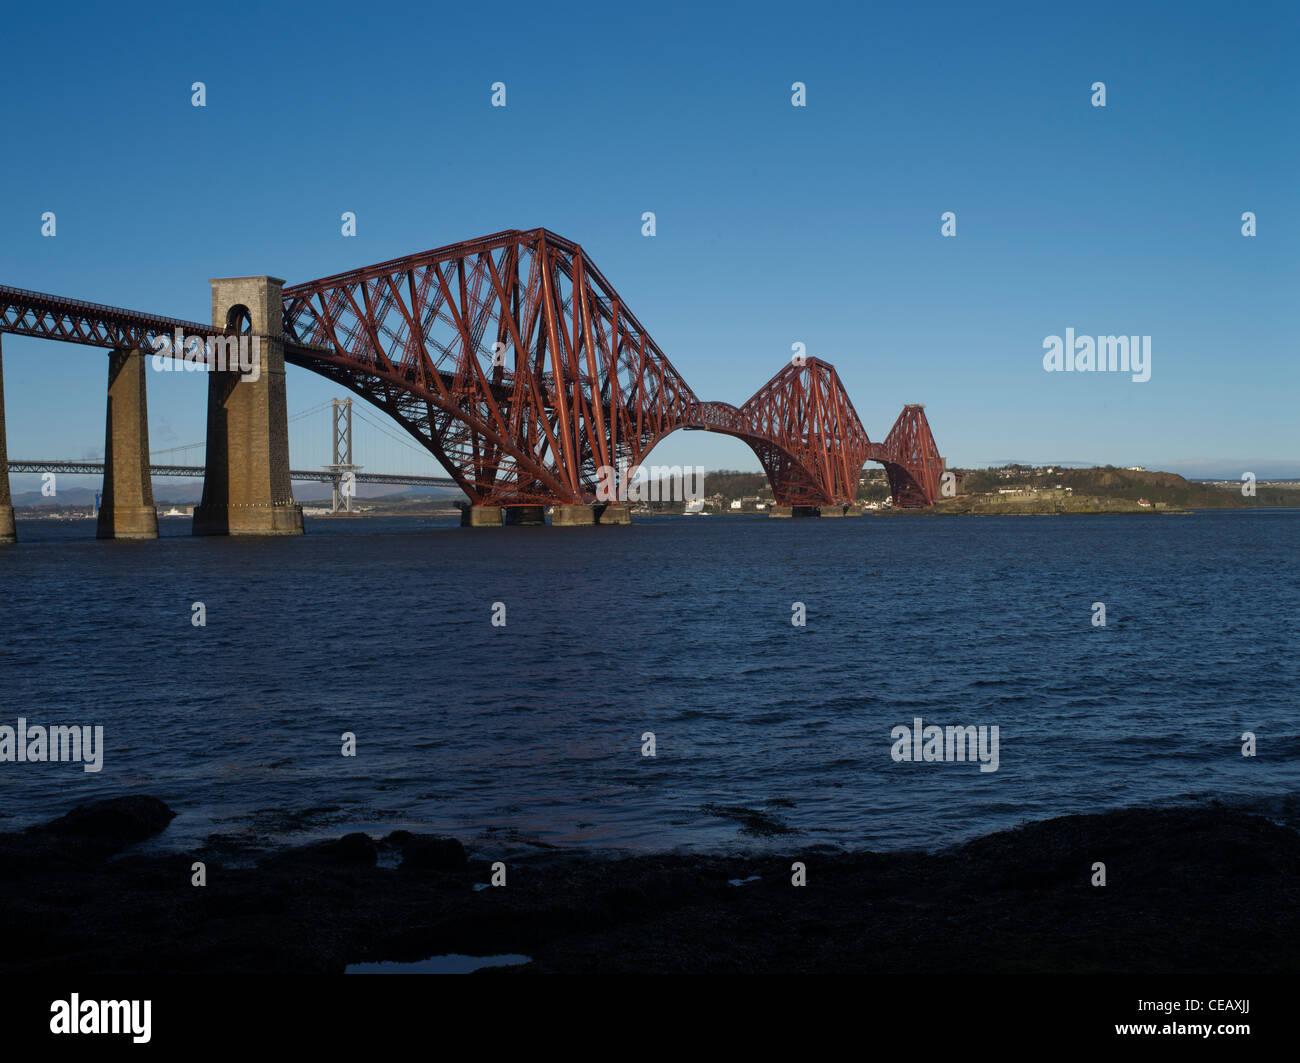 dh Forth Railway Bridge FORTH BRIDGE LOTHIAN Victorian Cantilever steel granite bridge river scotland iron bridges Stock Photo